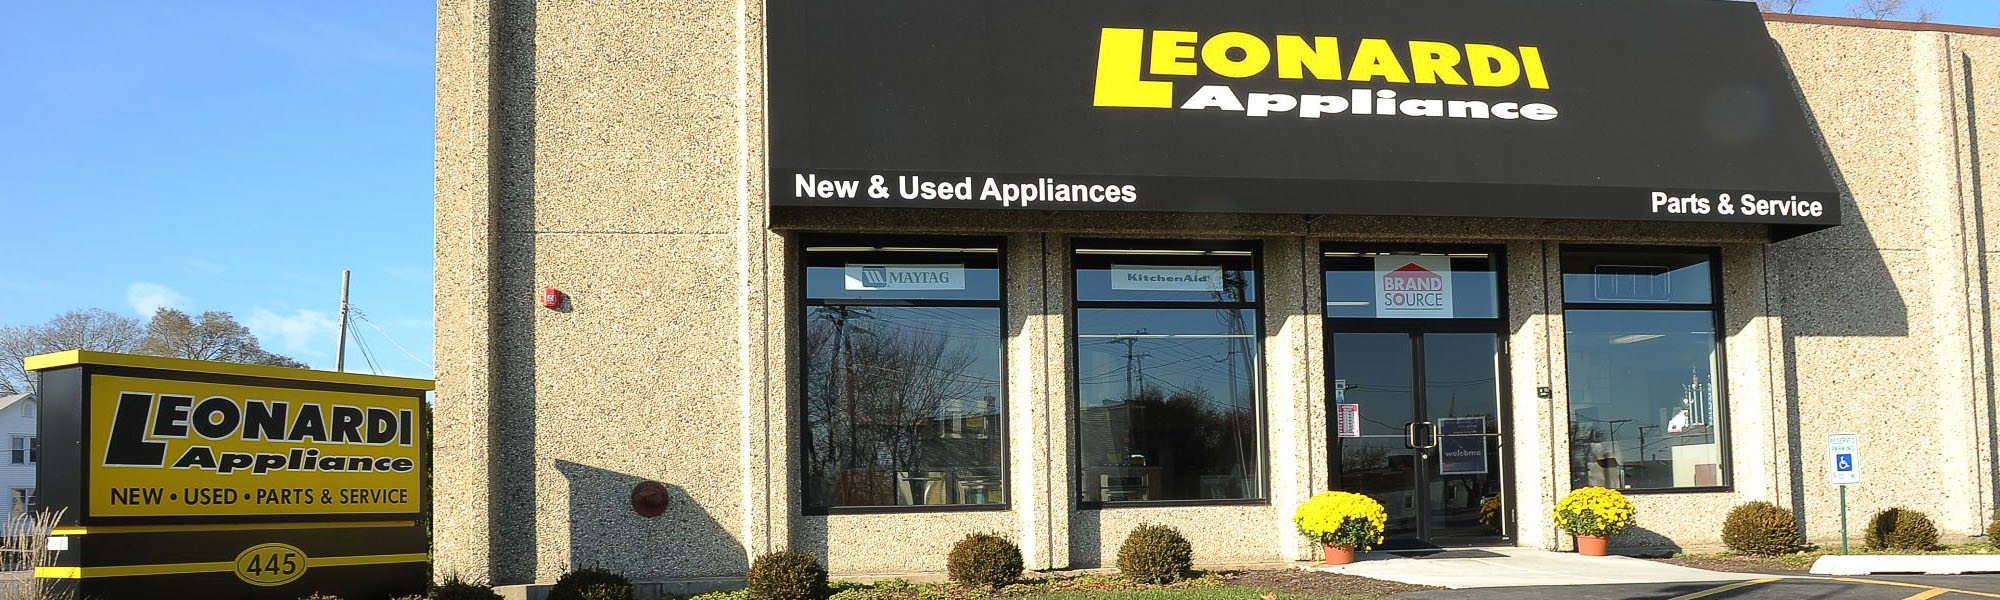 Leonardi Appliances